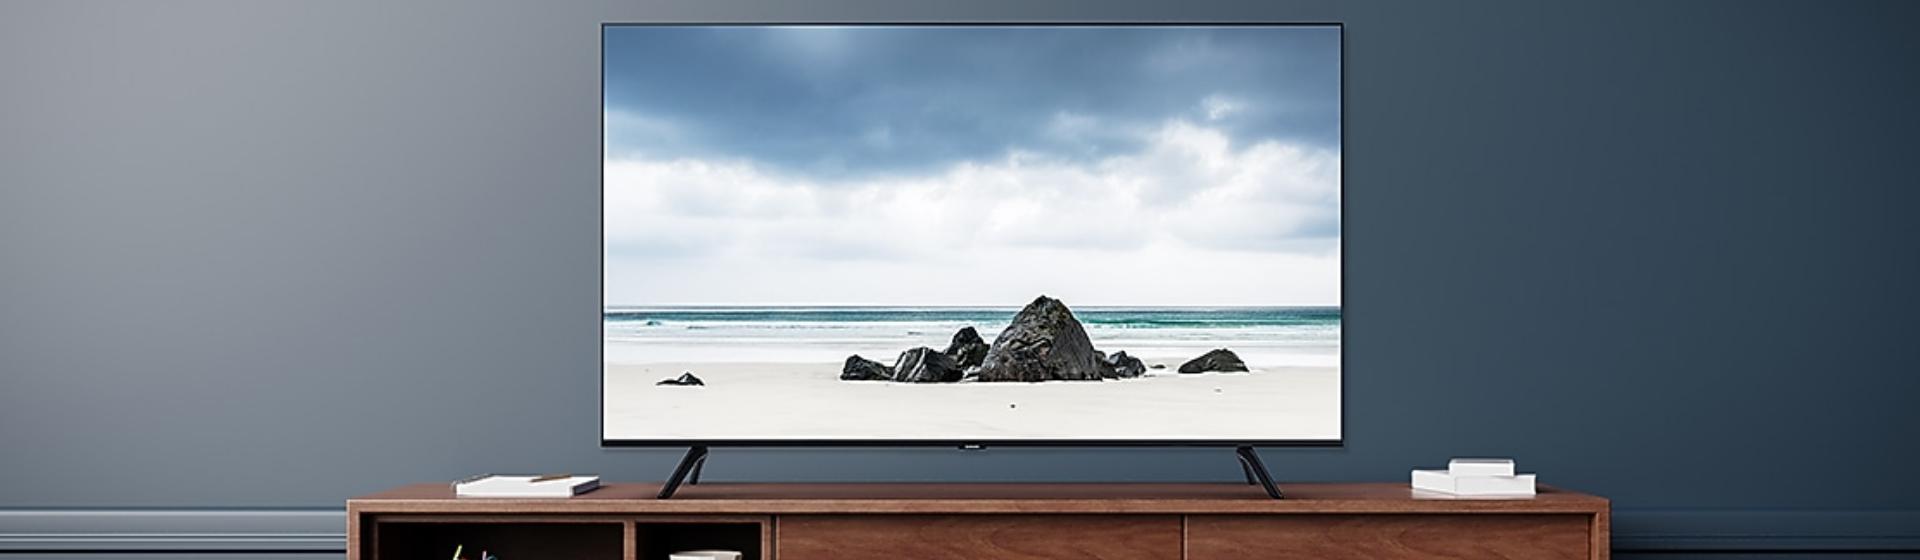 Alexa na TV Samsung: como conectar a assistente e comandar a TV por voz